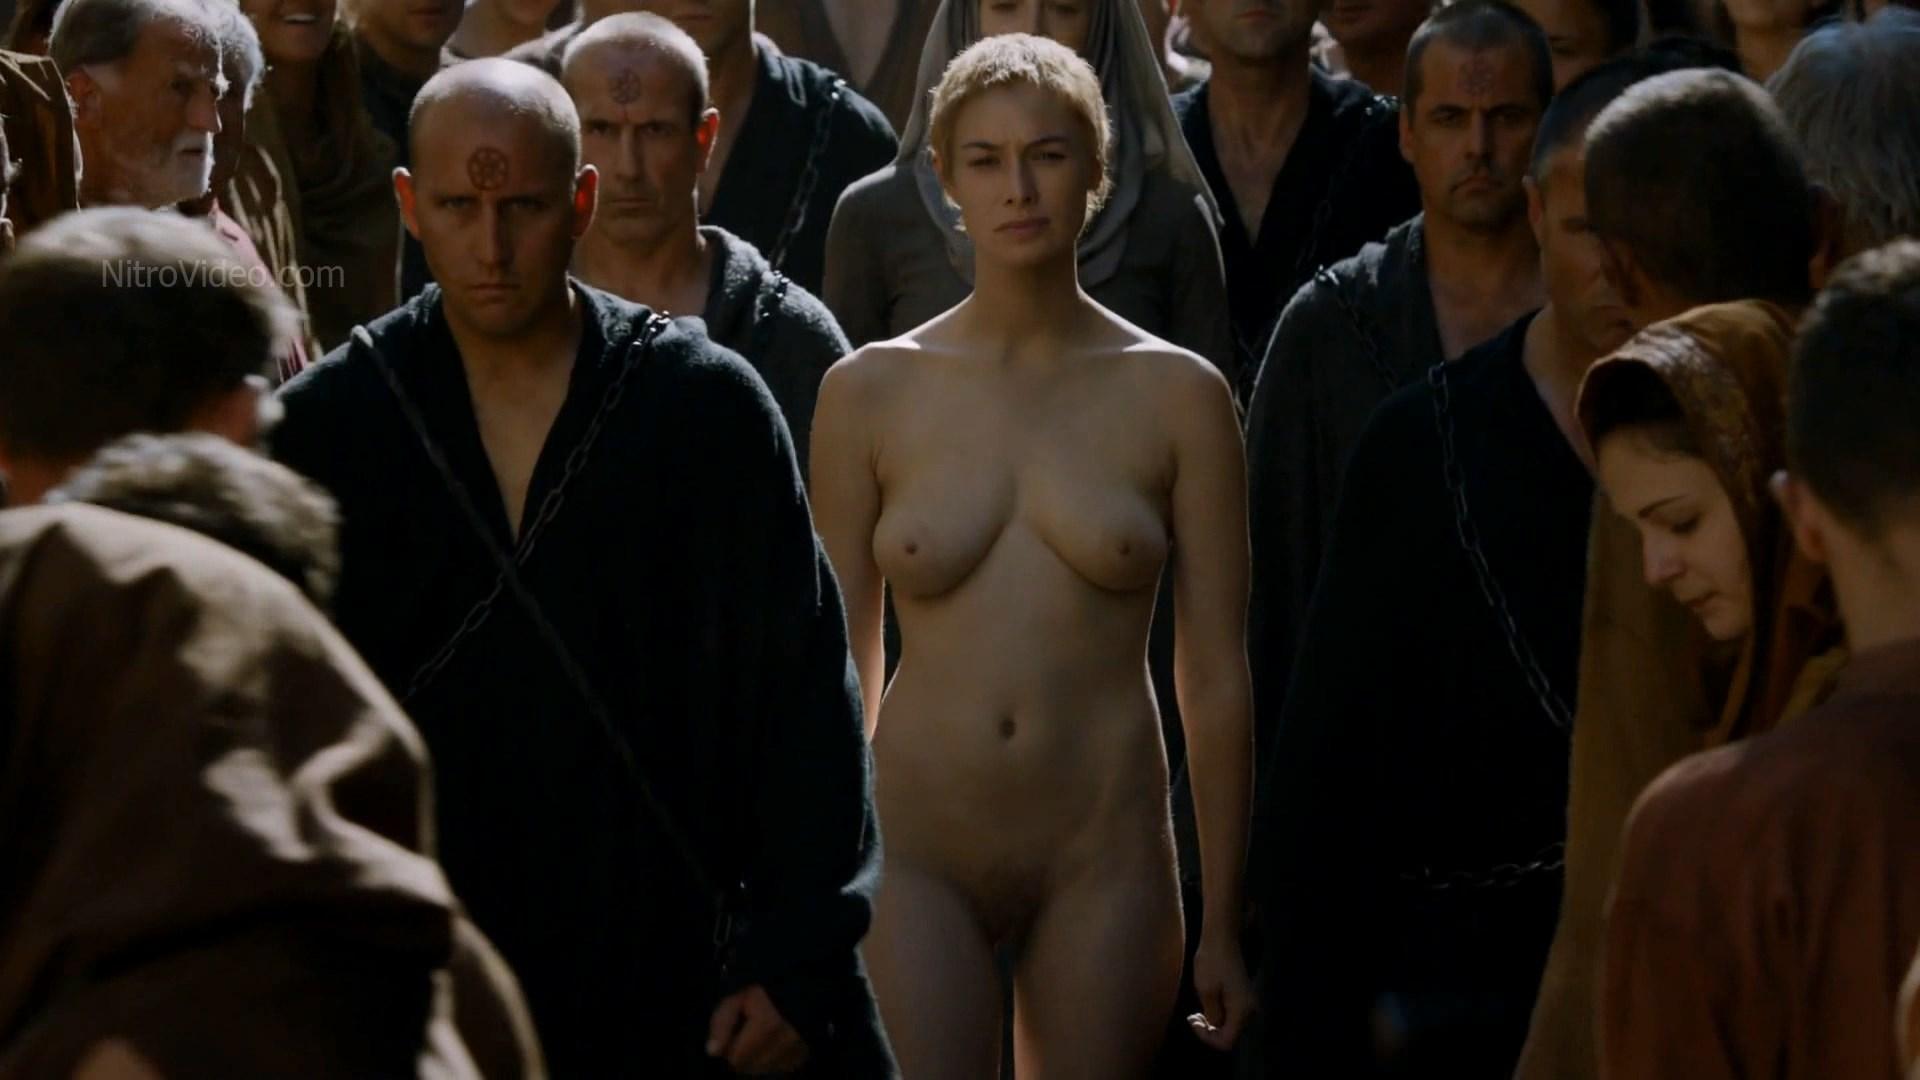 lena-headey-sex-scene-nude-nova-joy